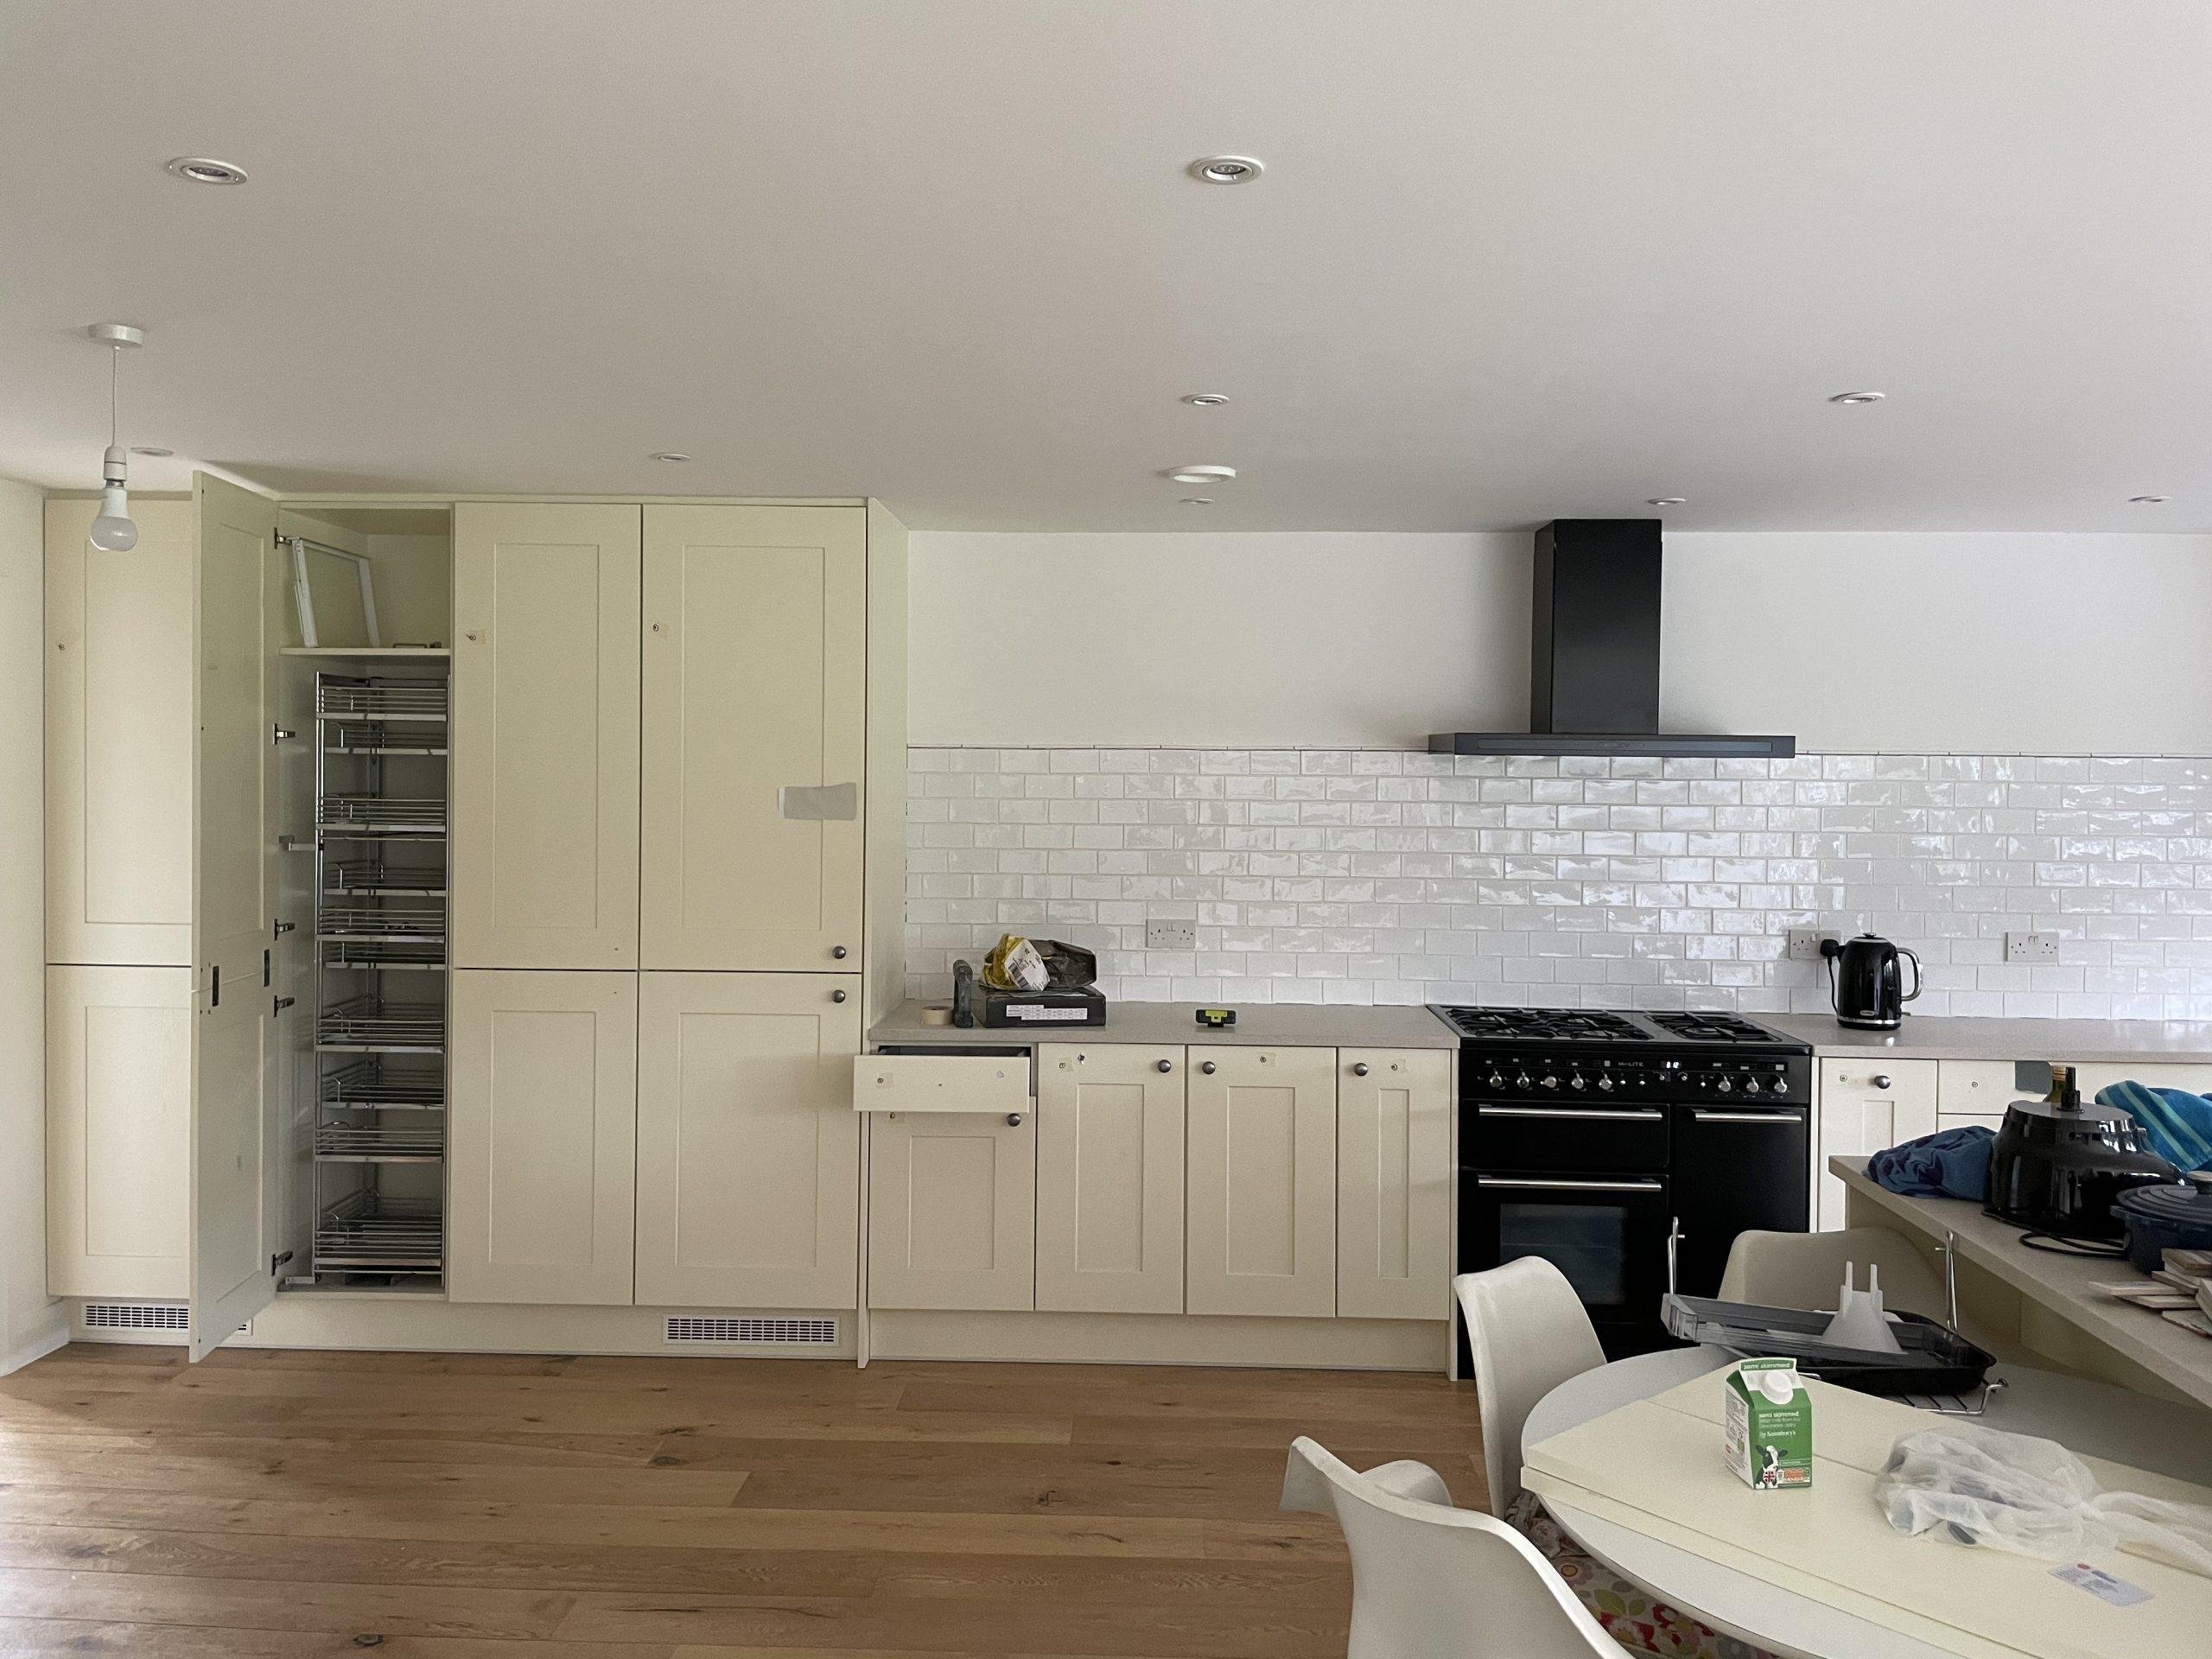 Kitchen cabinet painters Beaconsfield Buckinghamshire